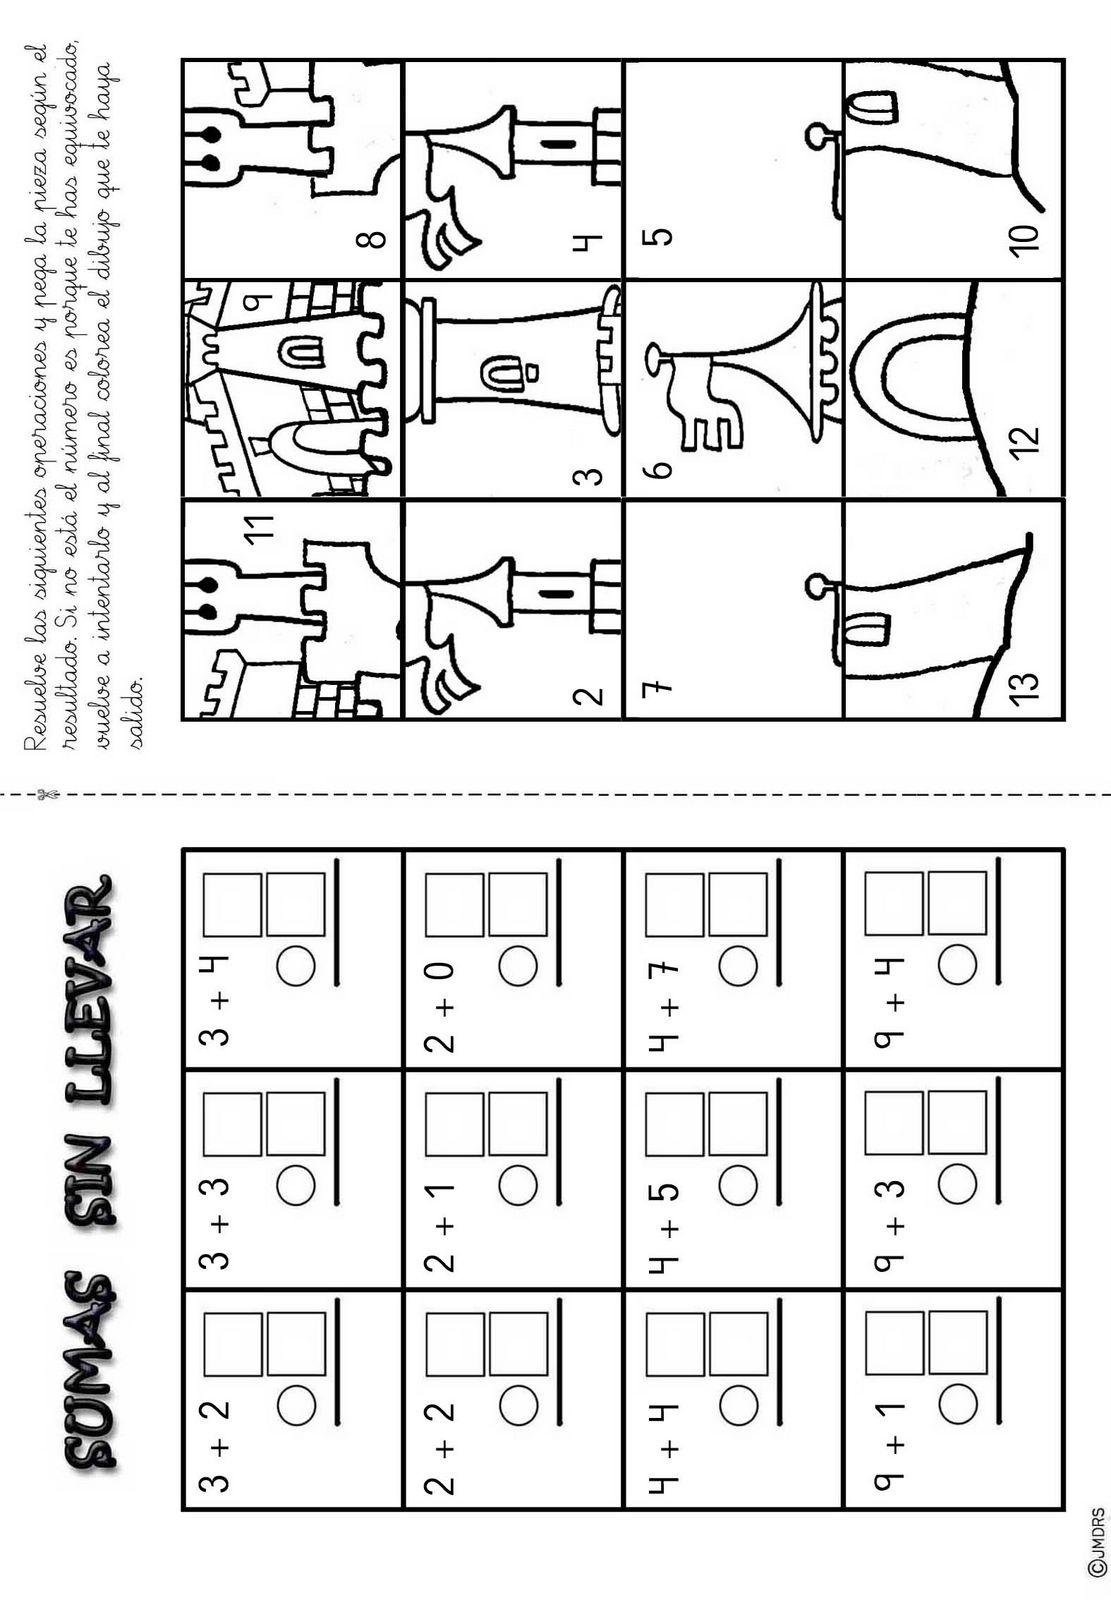 010103 Sumas sin llevar 1 dígito Puzzle V